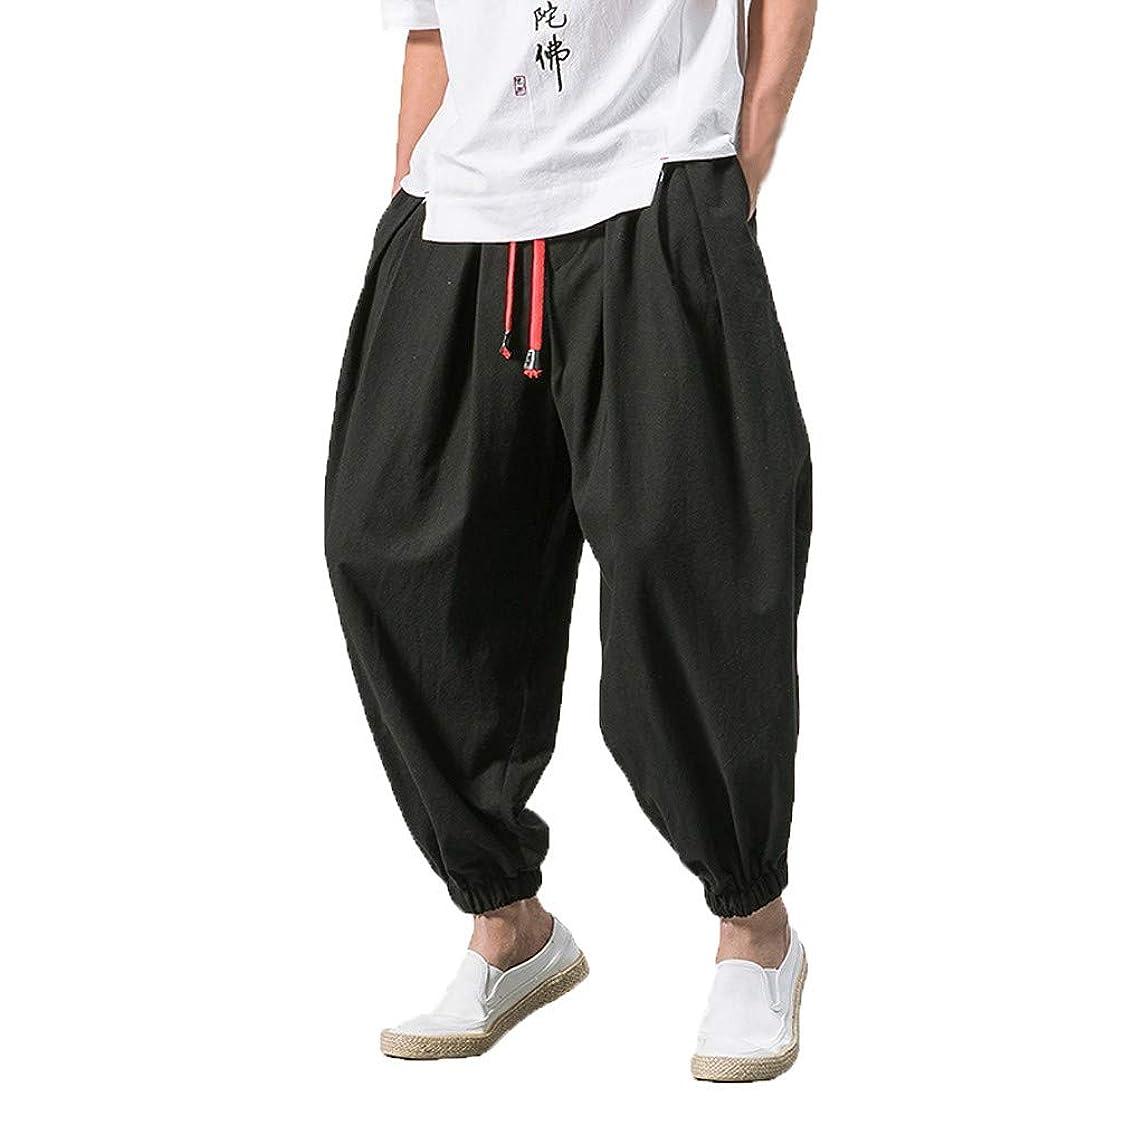 Men Summer Pants New Baggy Wide-Legged Pants Fashion Comfortable Trouser